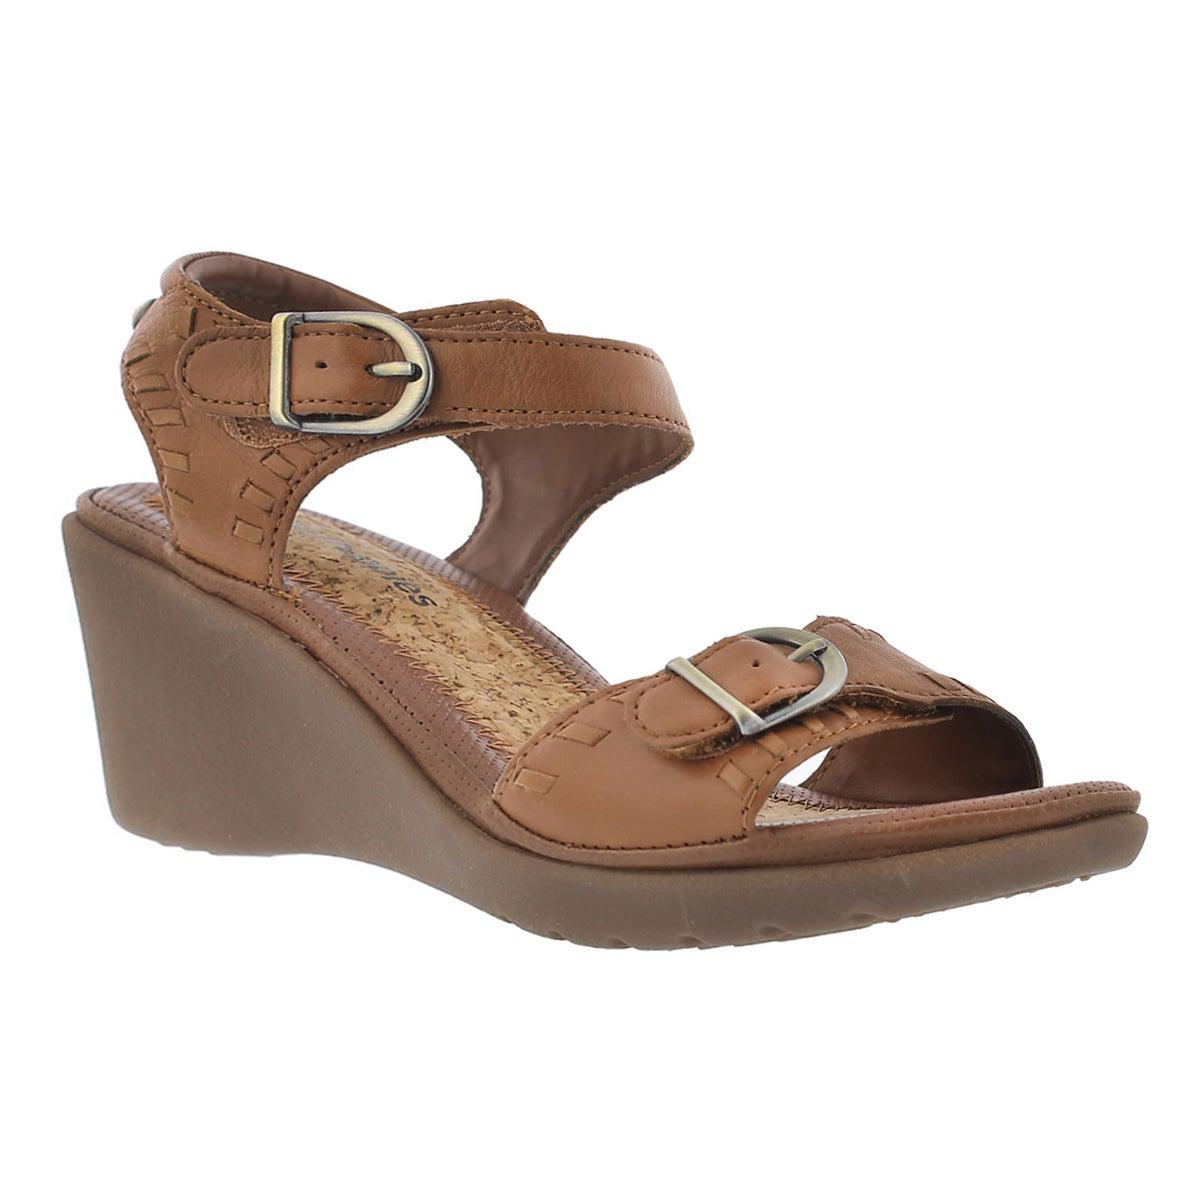 Women's NOELLE RUSSO tan wedge sandals